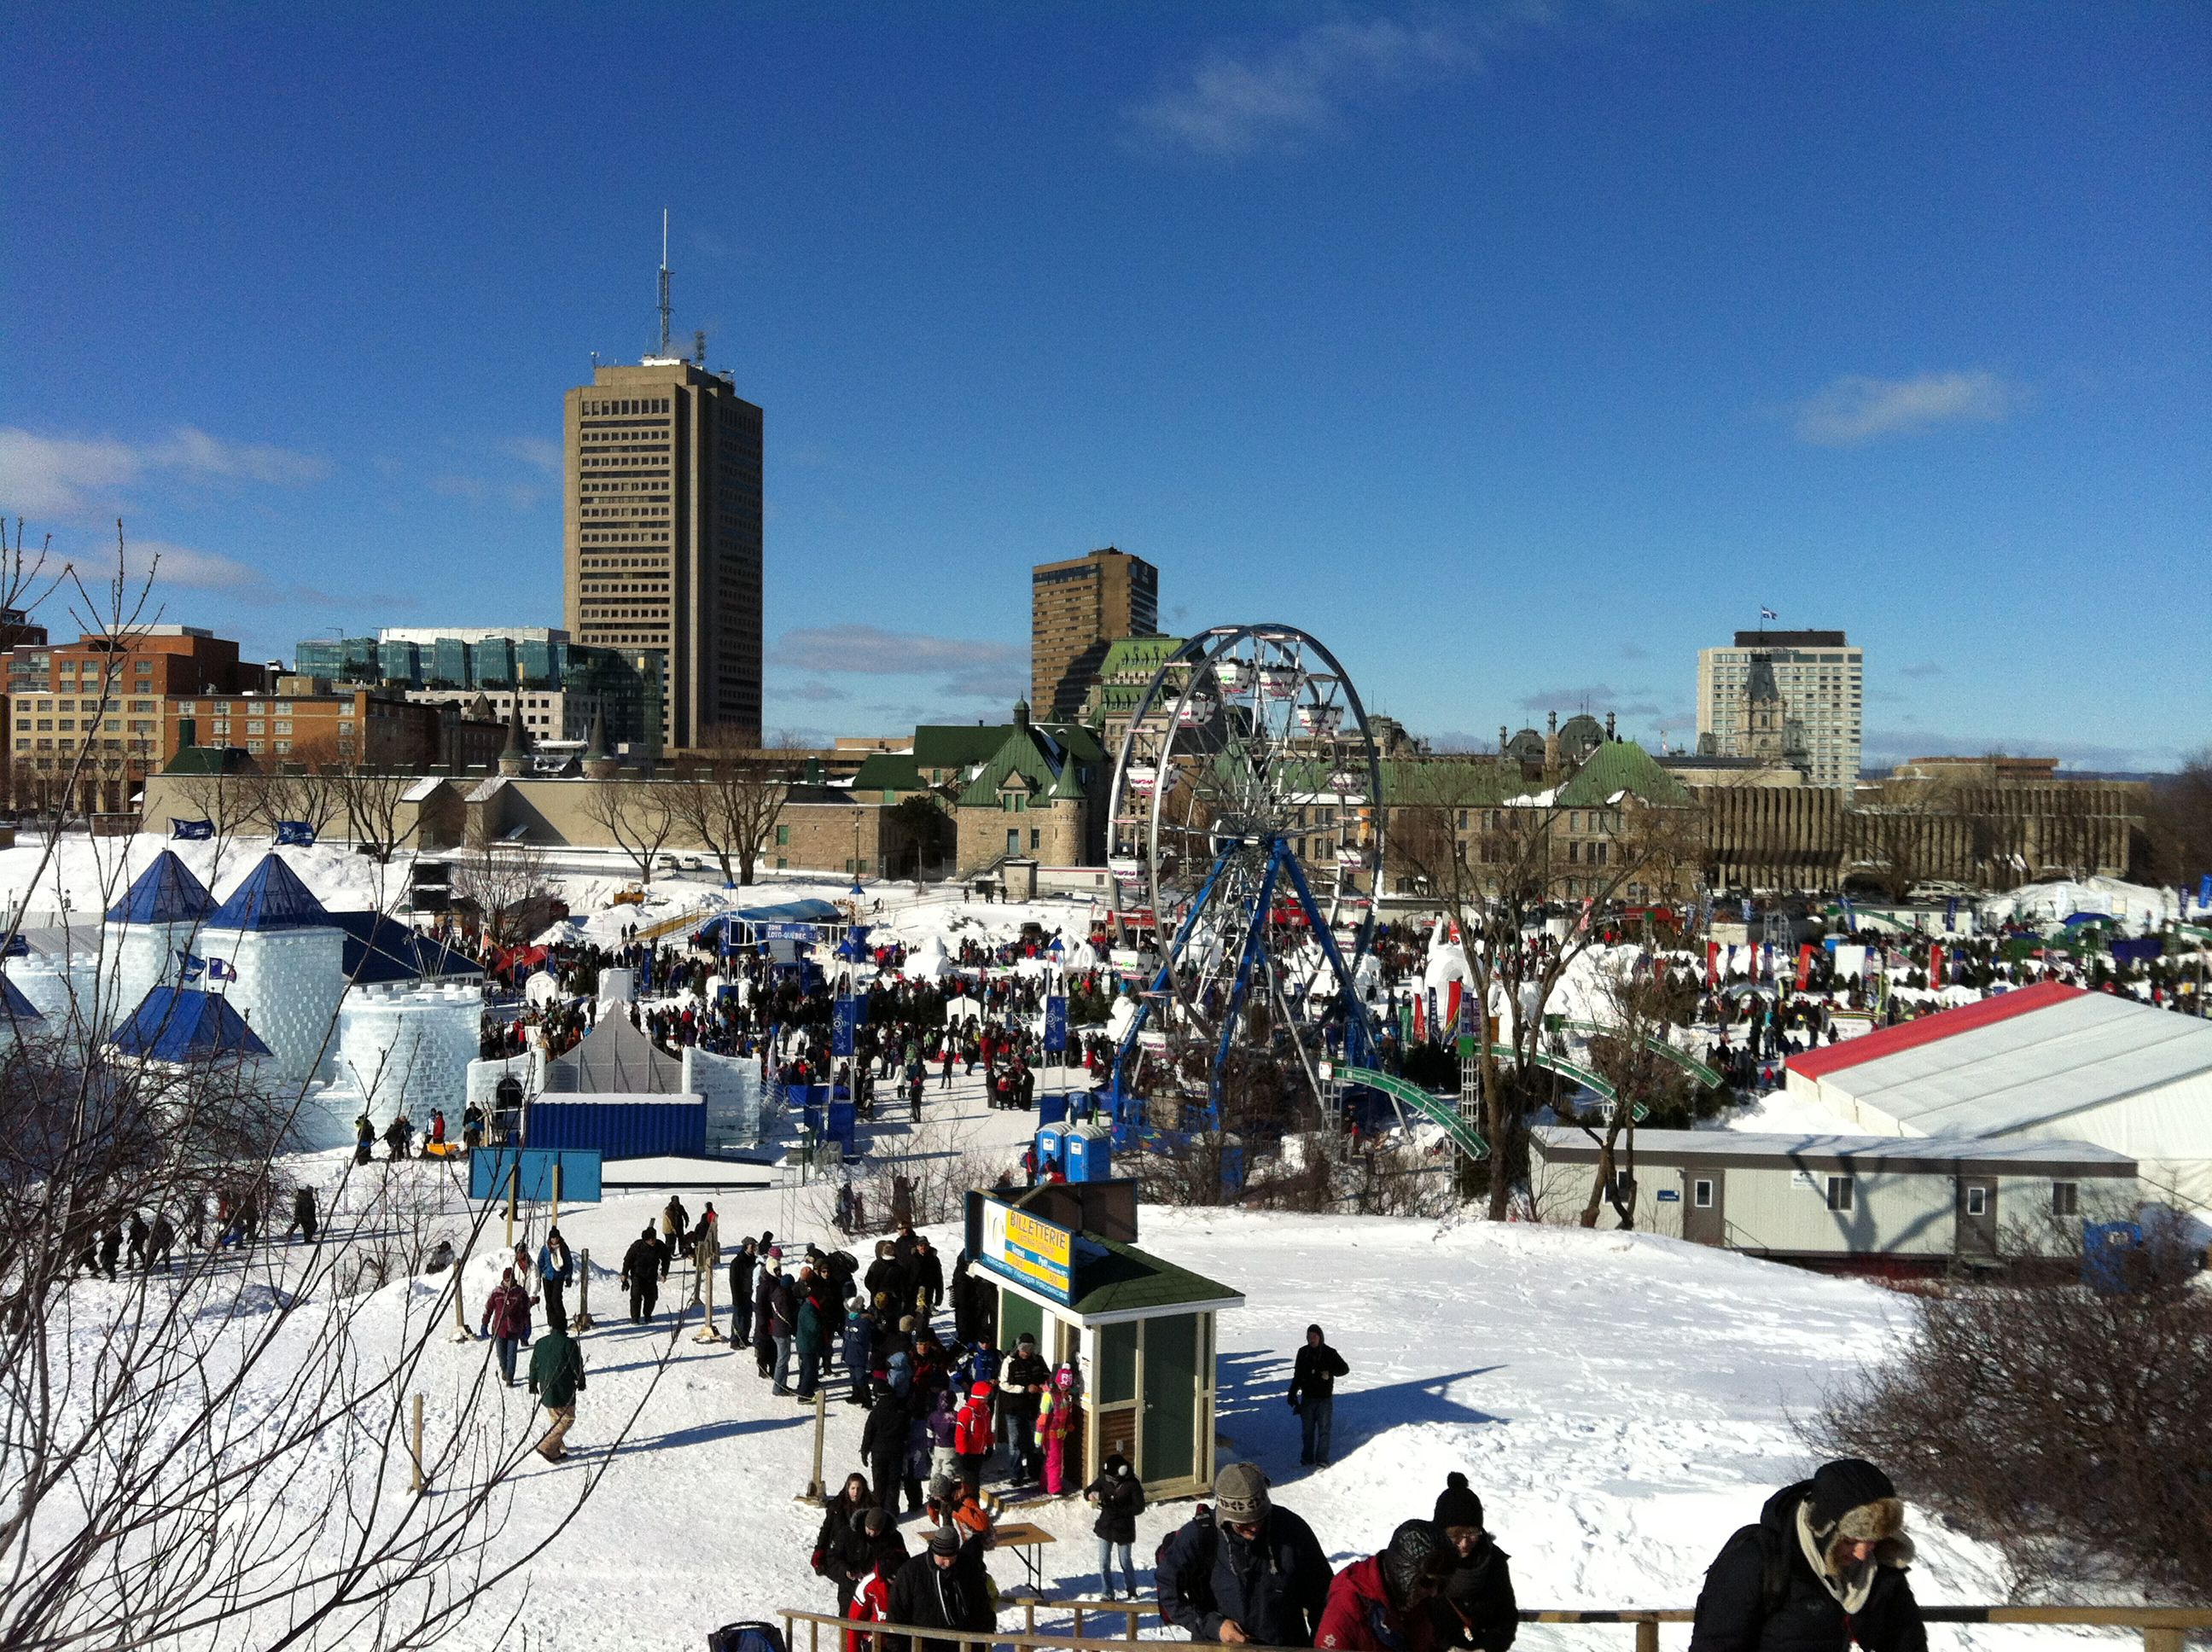 Quebec Winter Carnival's Place Desjardins